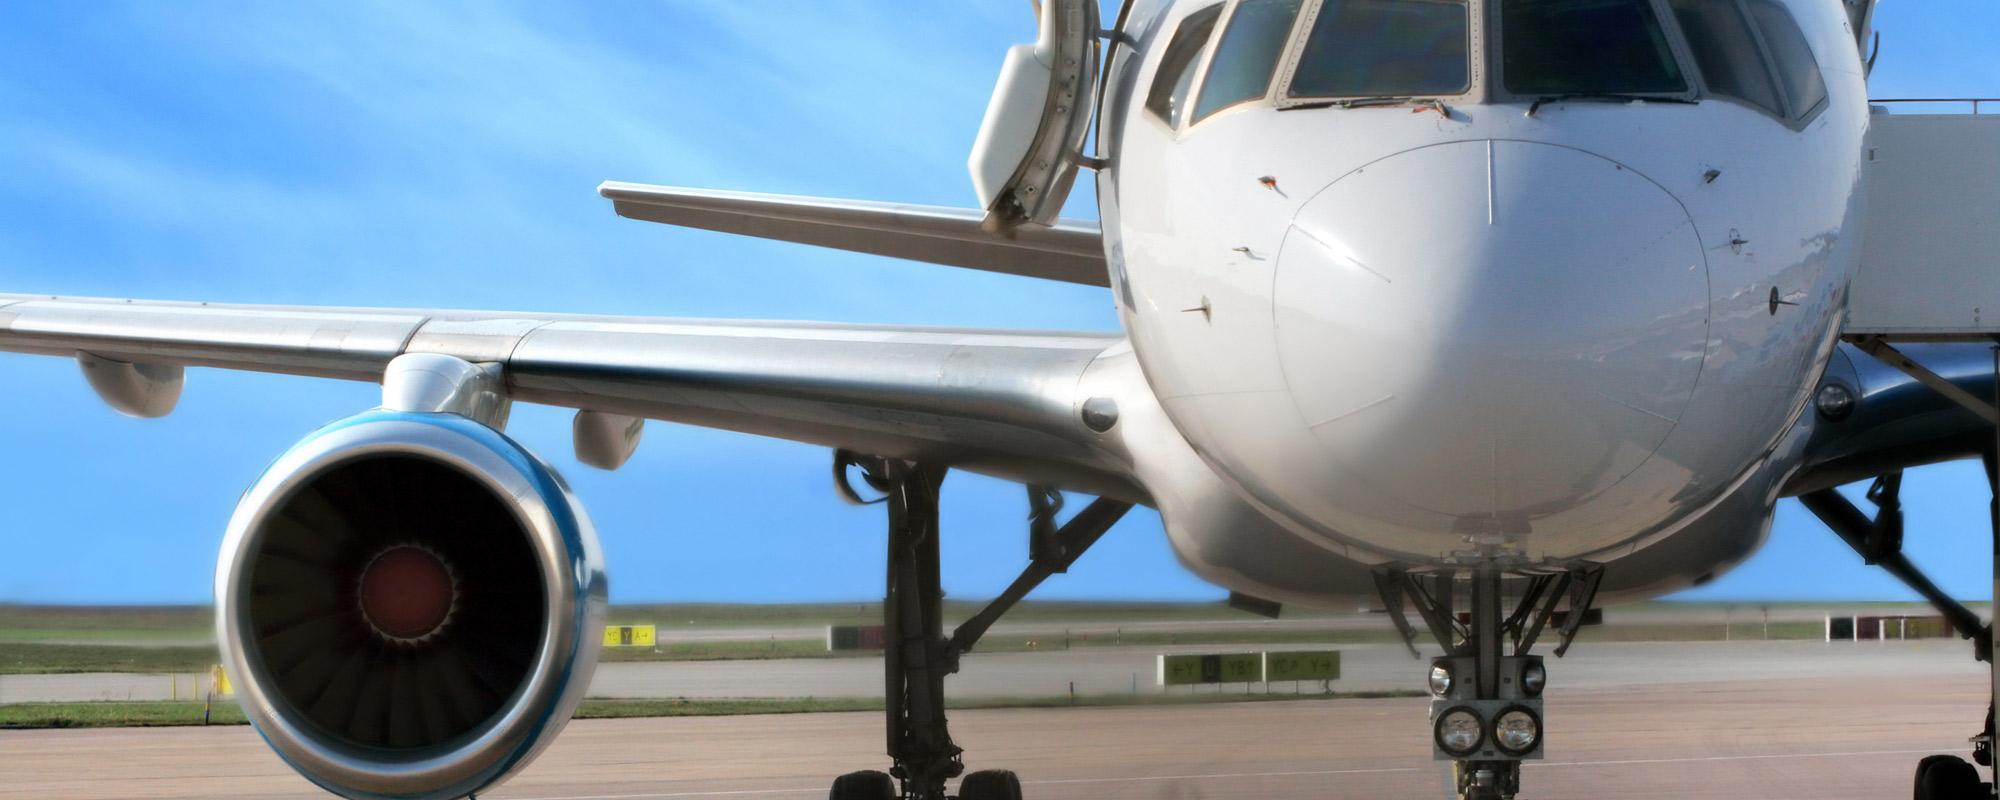 aircraft-header